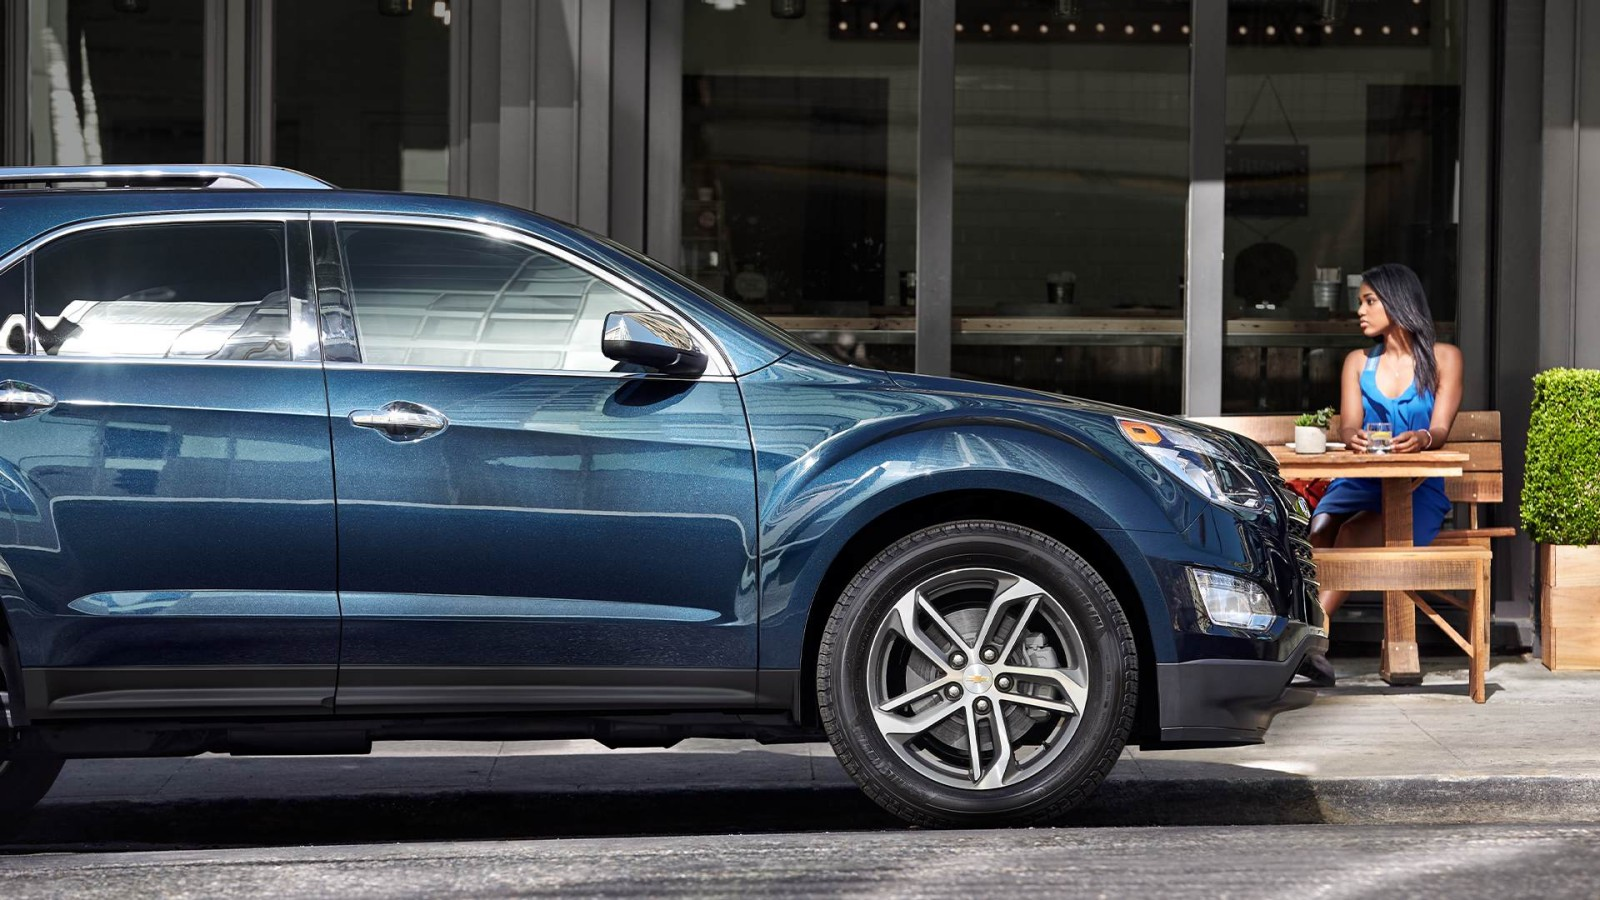 2016 Chevrolet Equinox Design